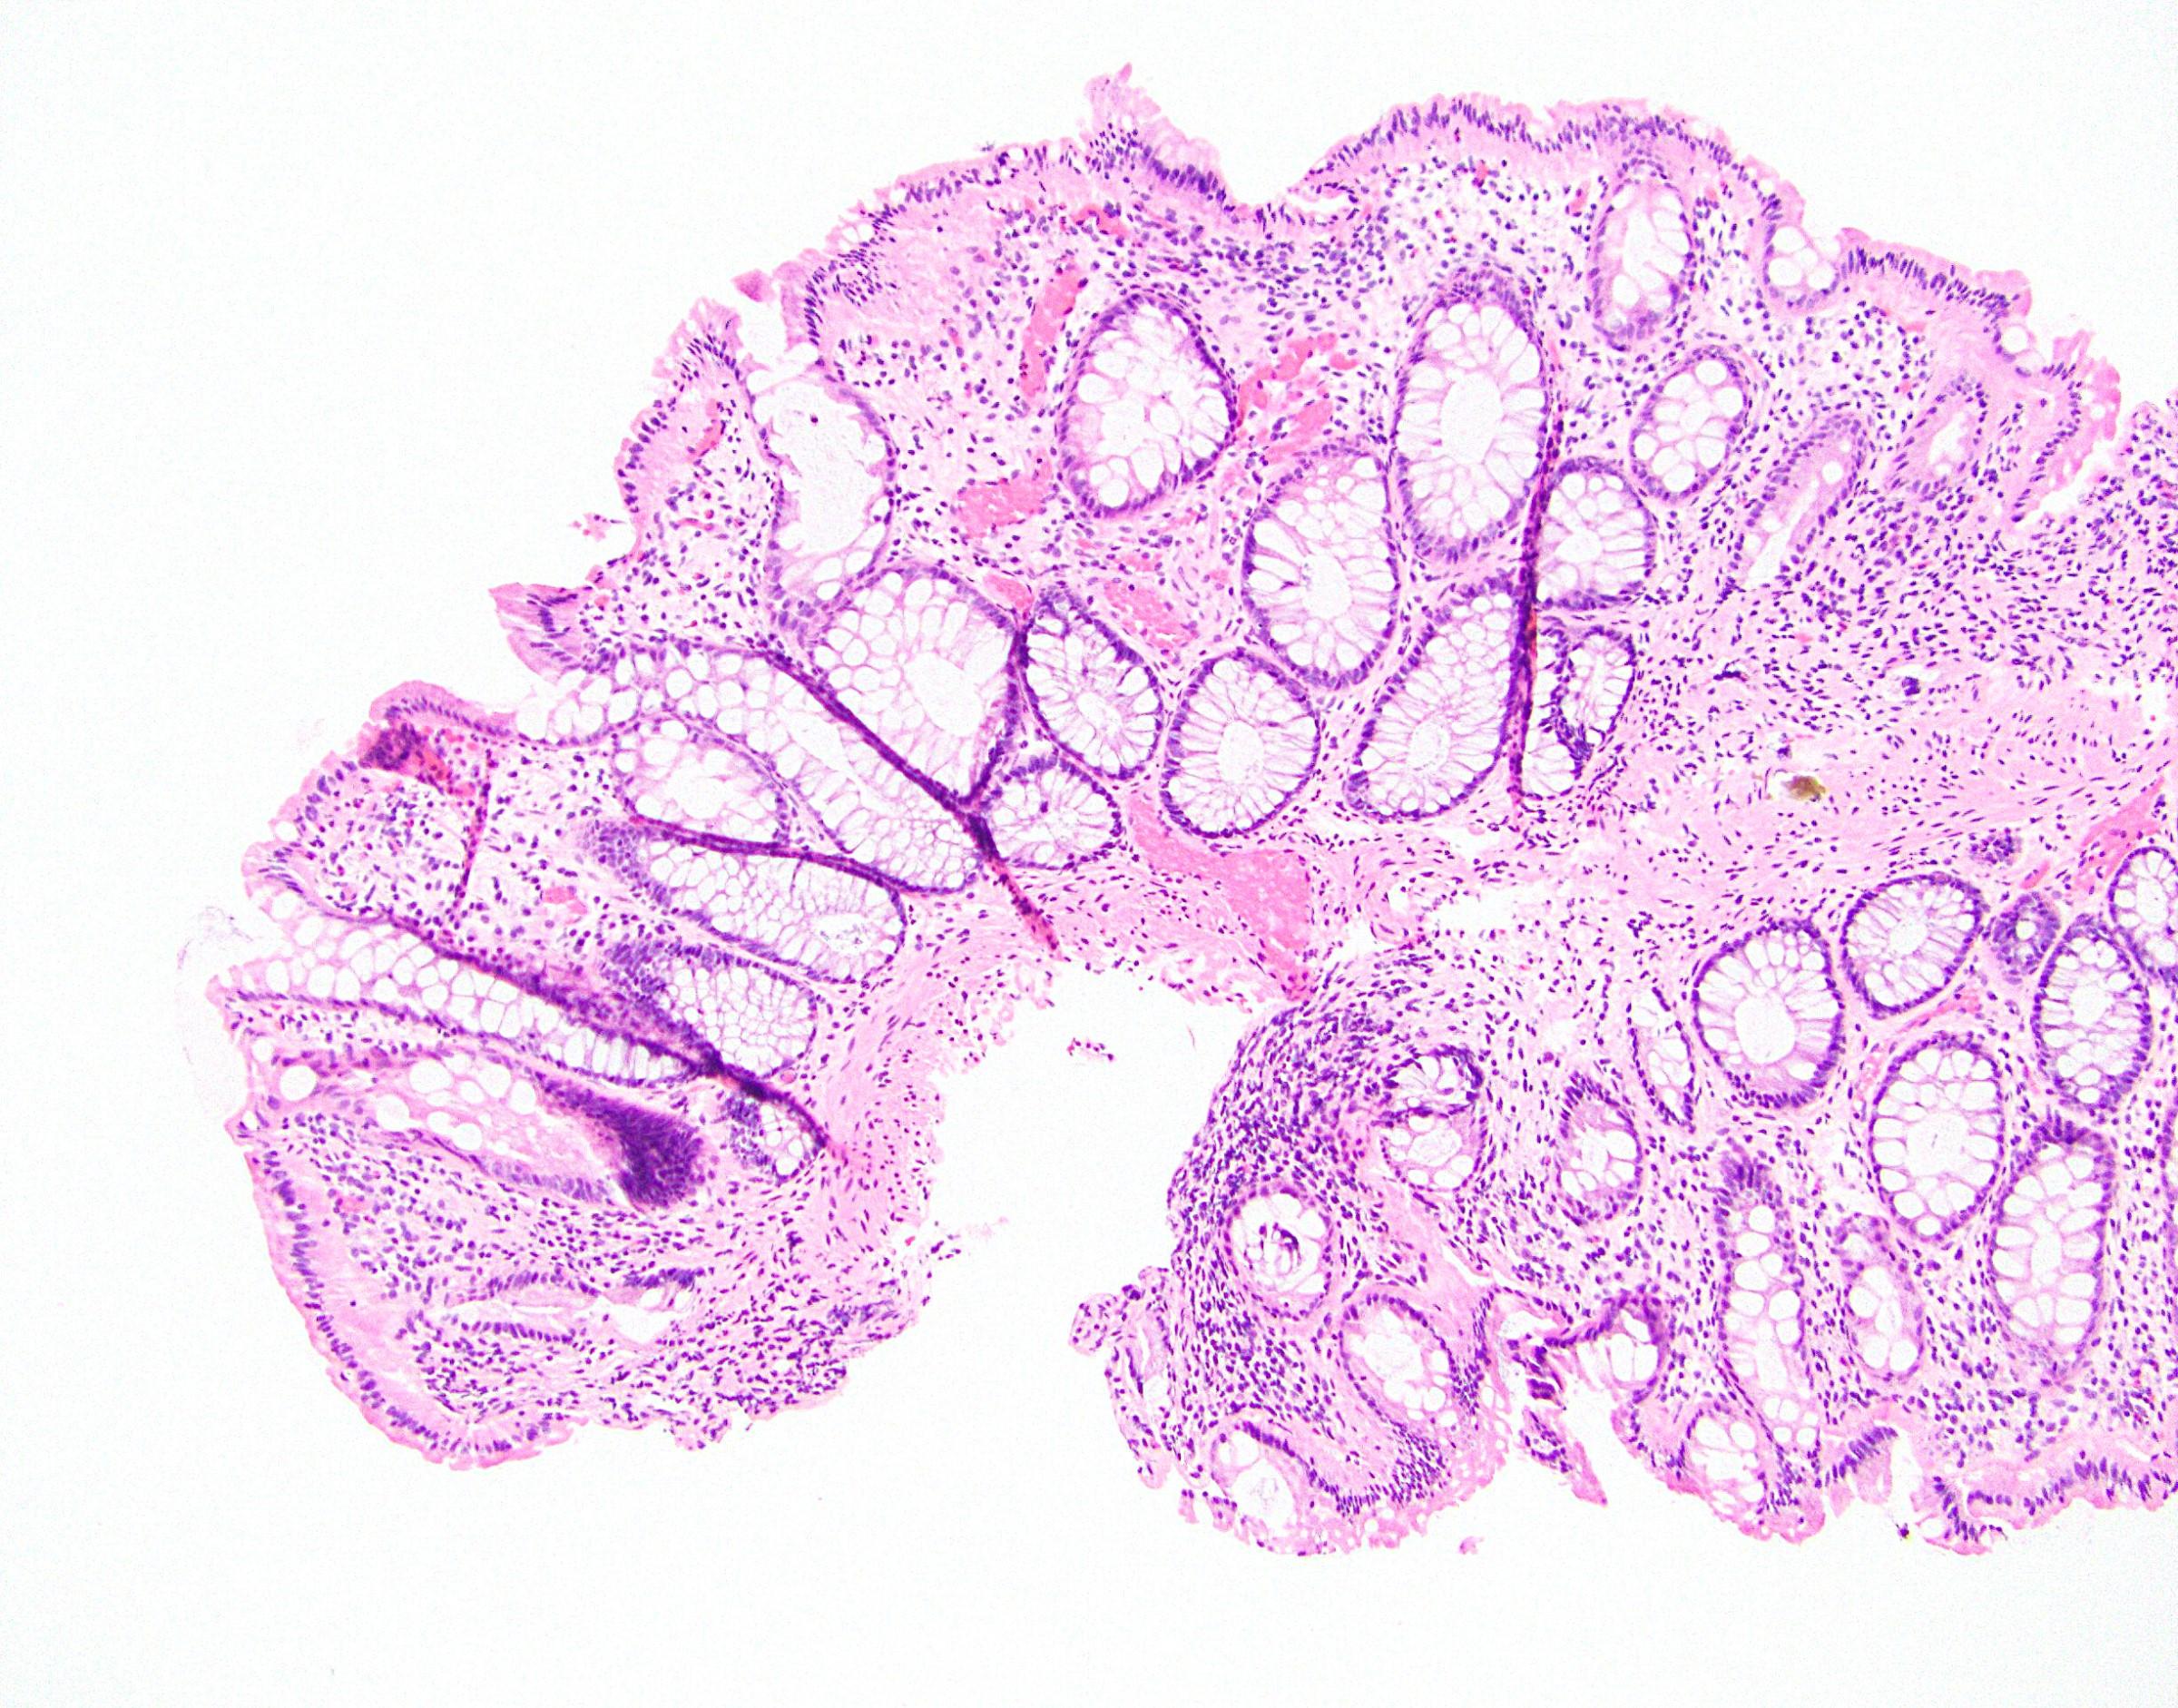 Colonic hemangioma